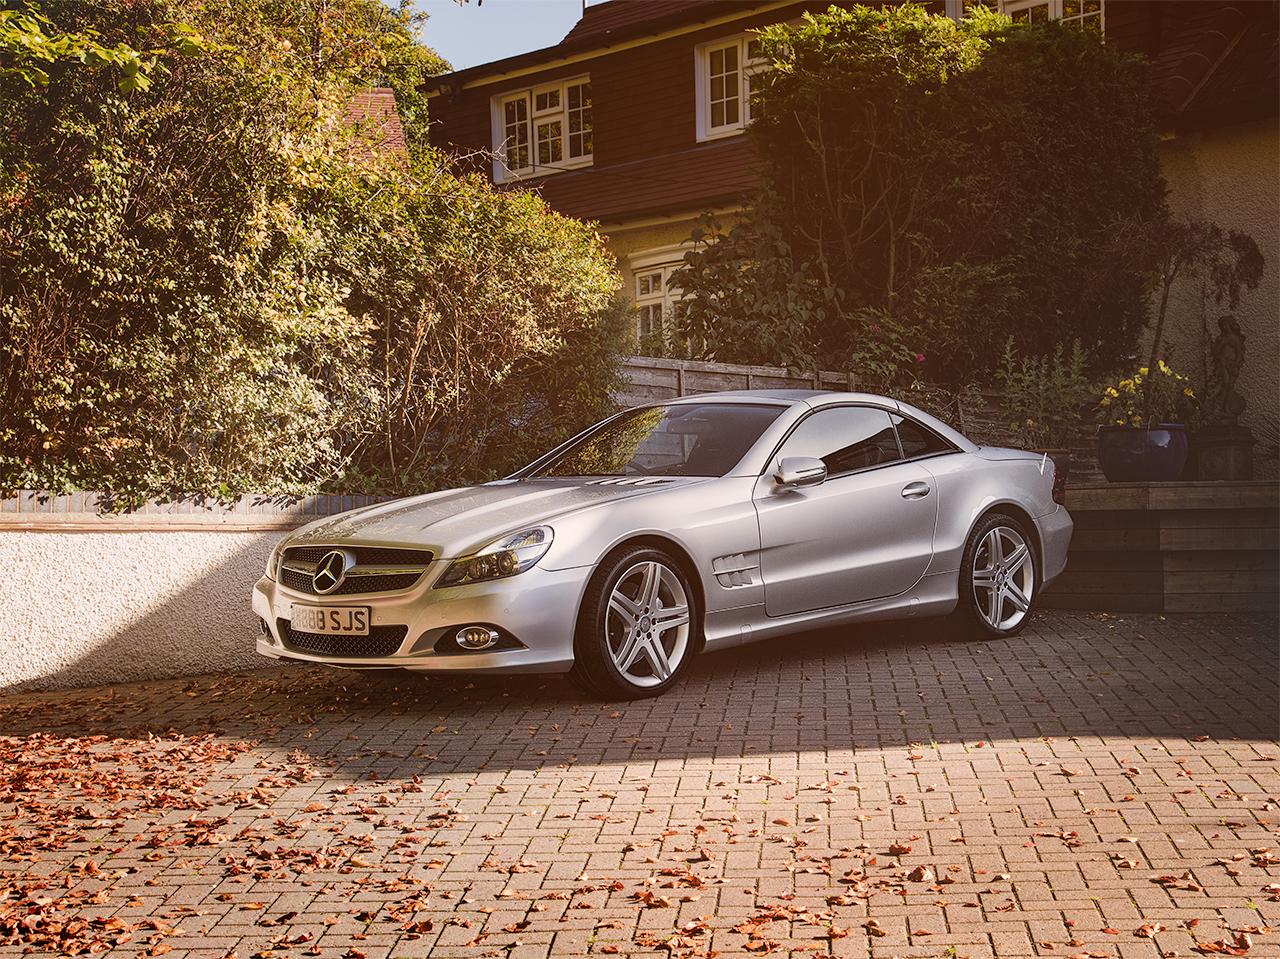 Mercedes SL550 by automotive photographer Kent Darren Woolway